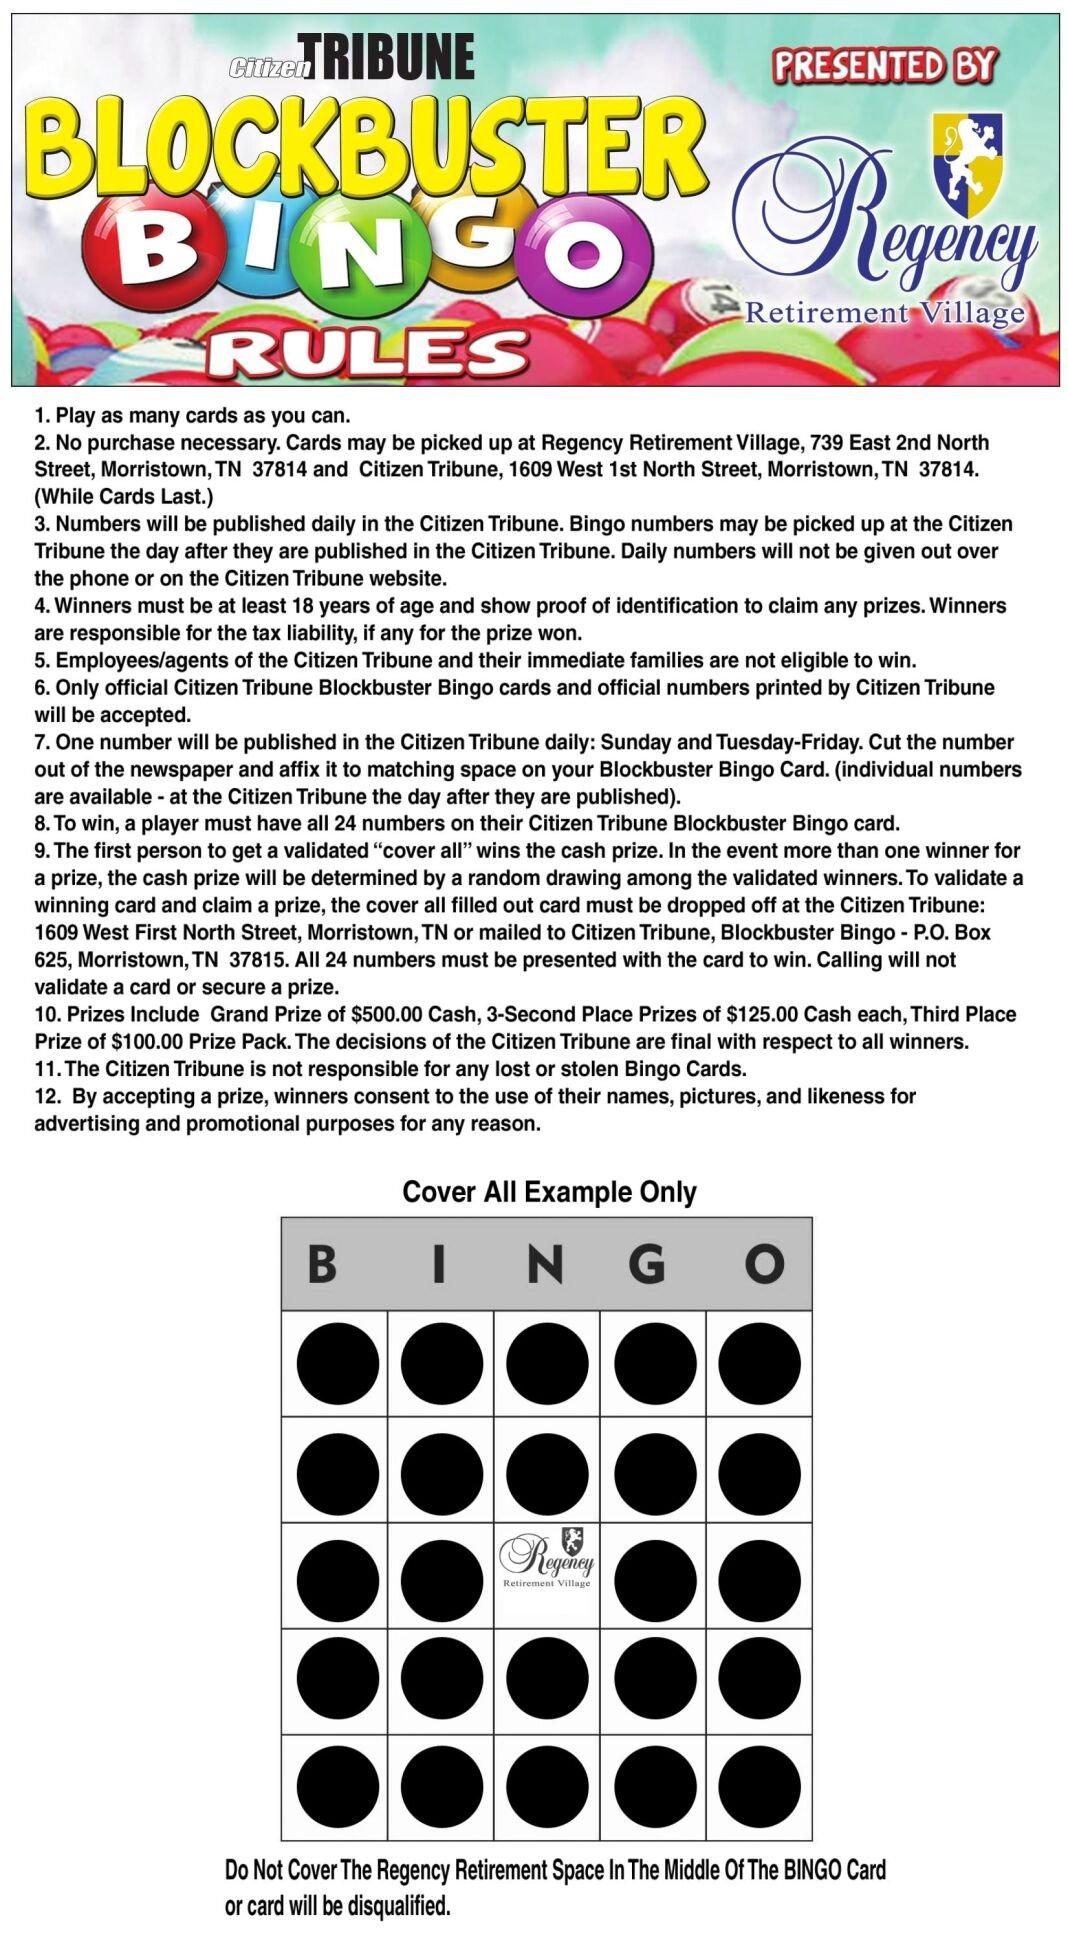 BLOCKBUSTER BINGO RULES